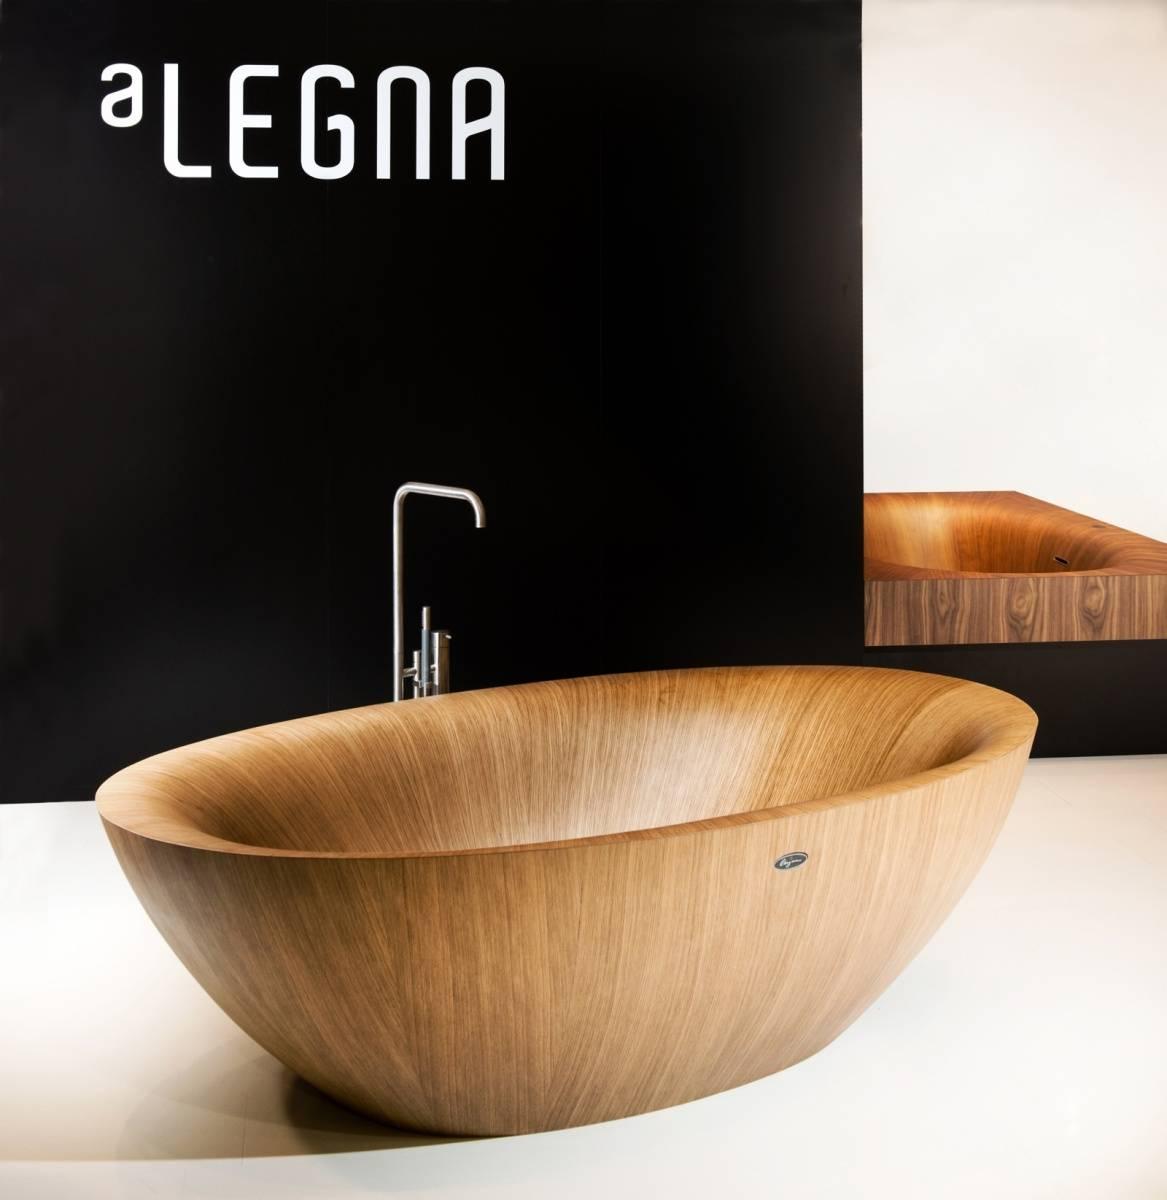 Laguna Pearl –Alegna